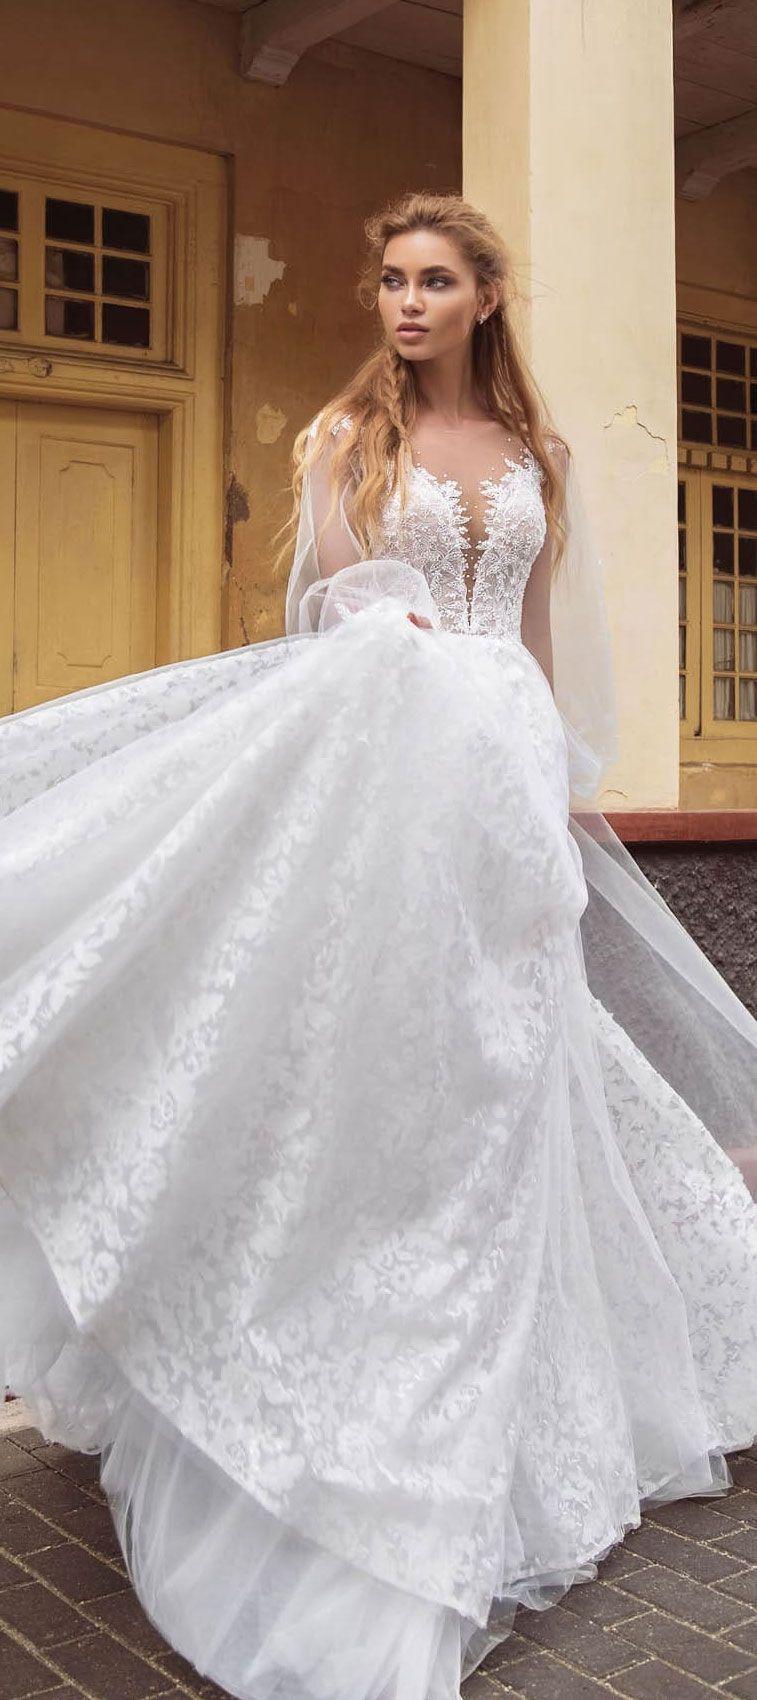 Lanesta Wedding Dresses – Treasure of the seas bridal collection